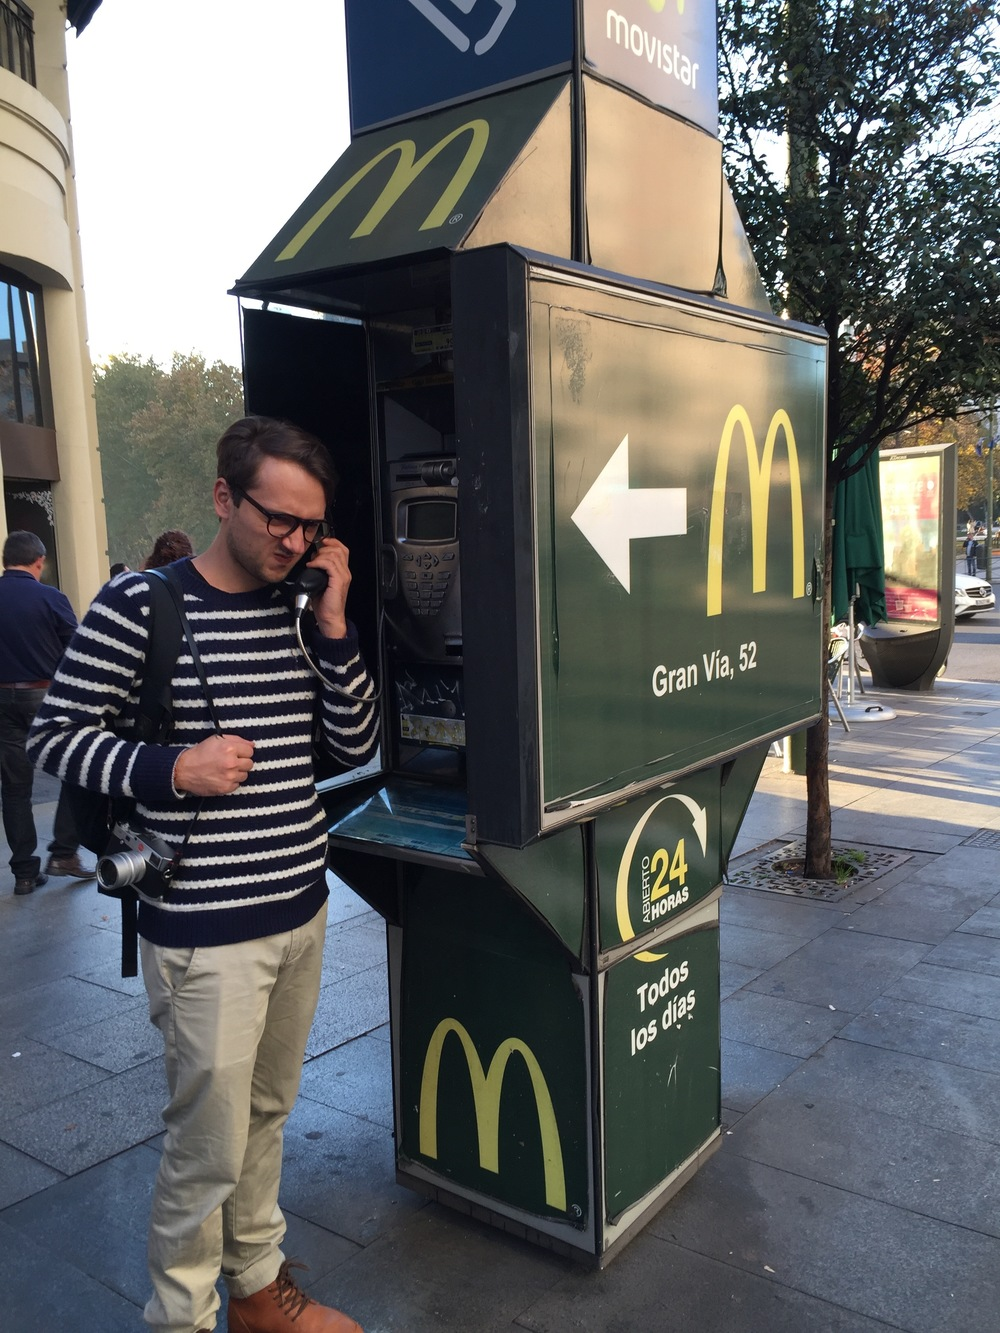 Calling all McDonalds!Calling all McDonalds!